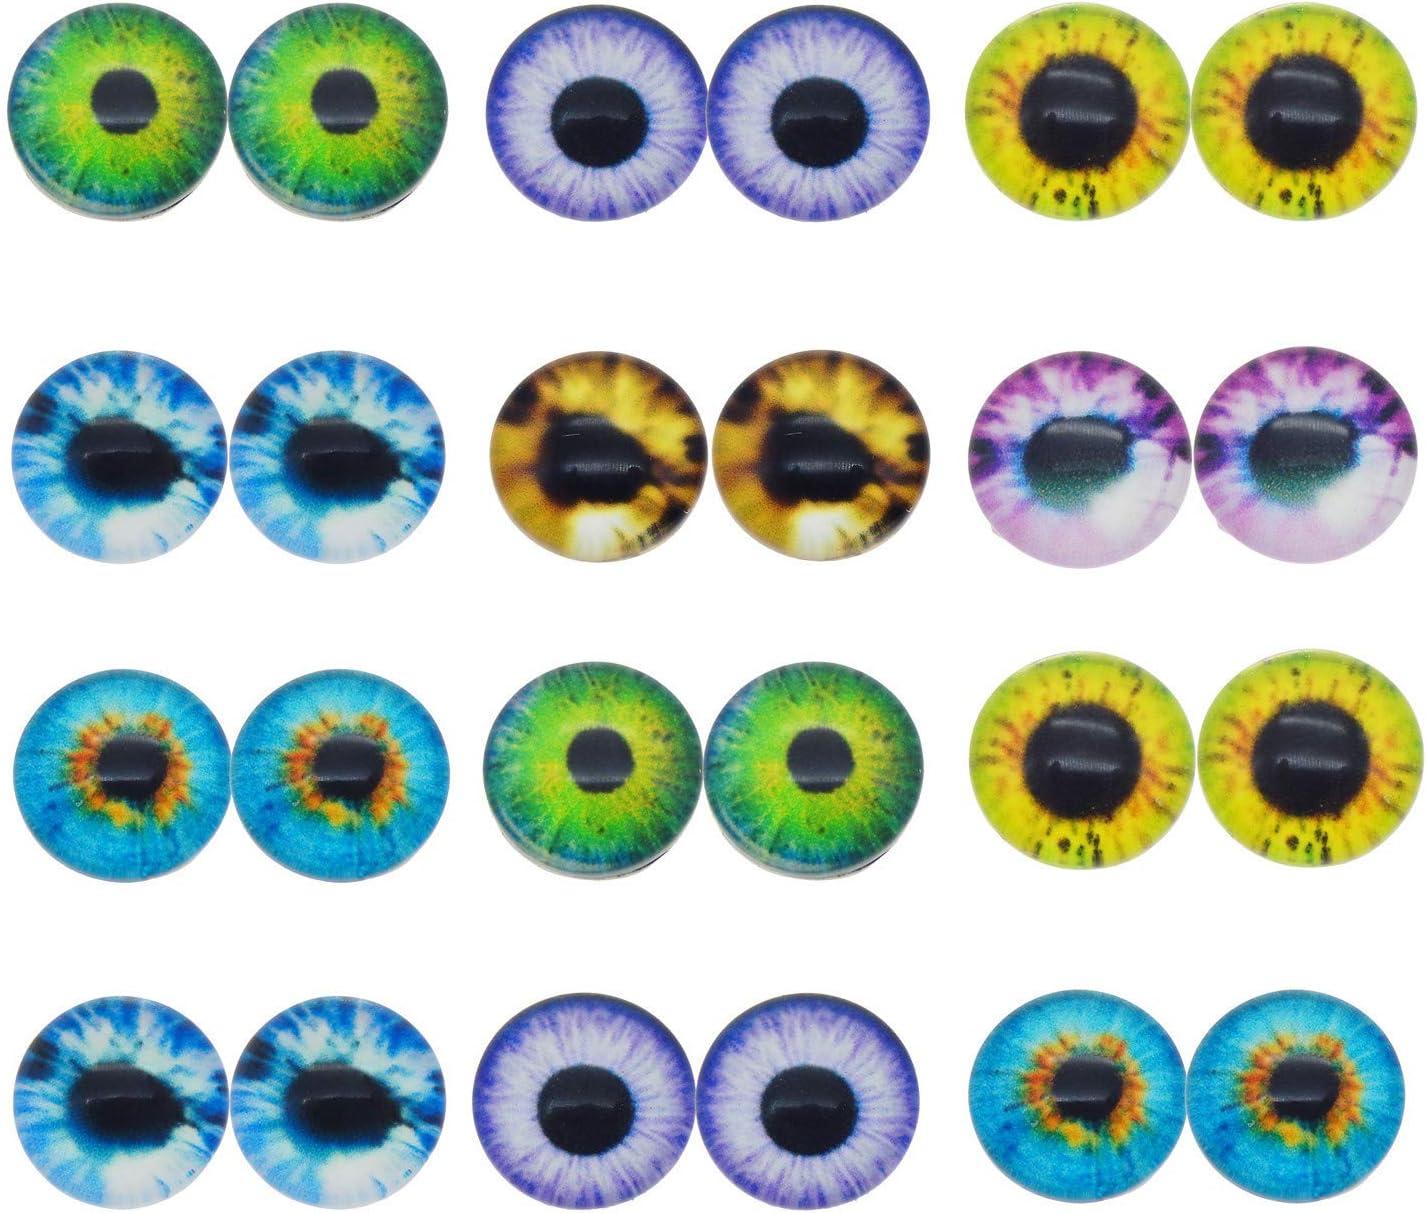 9mm Acrylic Doll Eyes Green New Plastic Eye 60pc !!